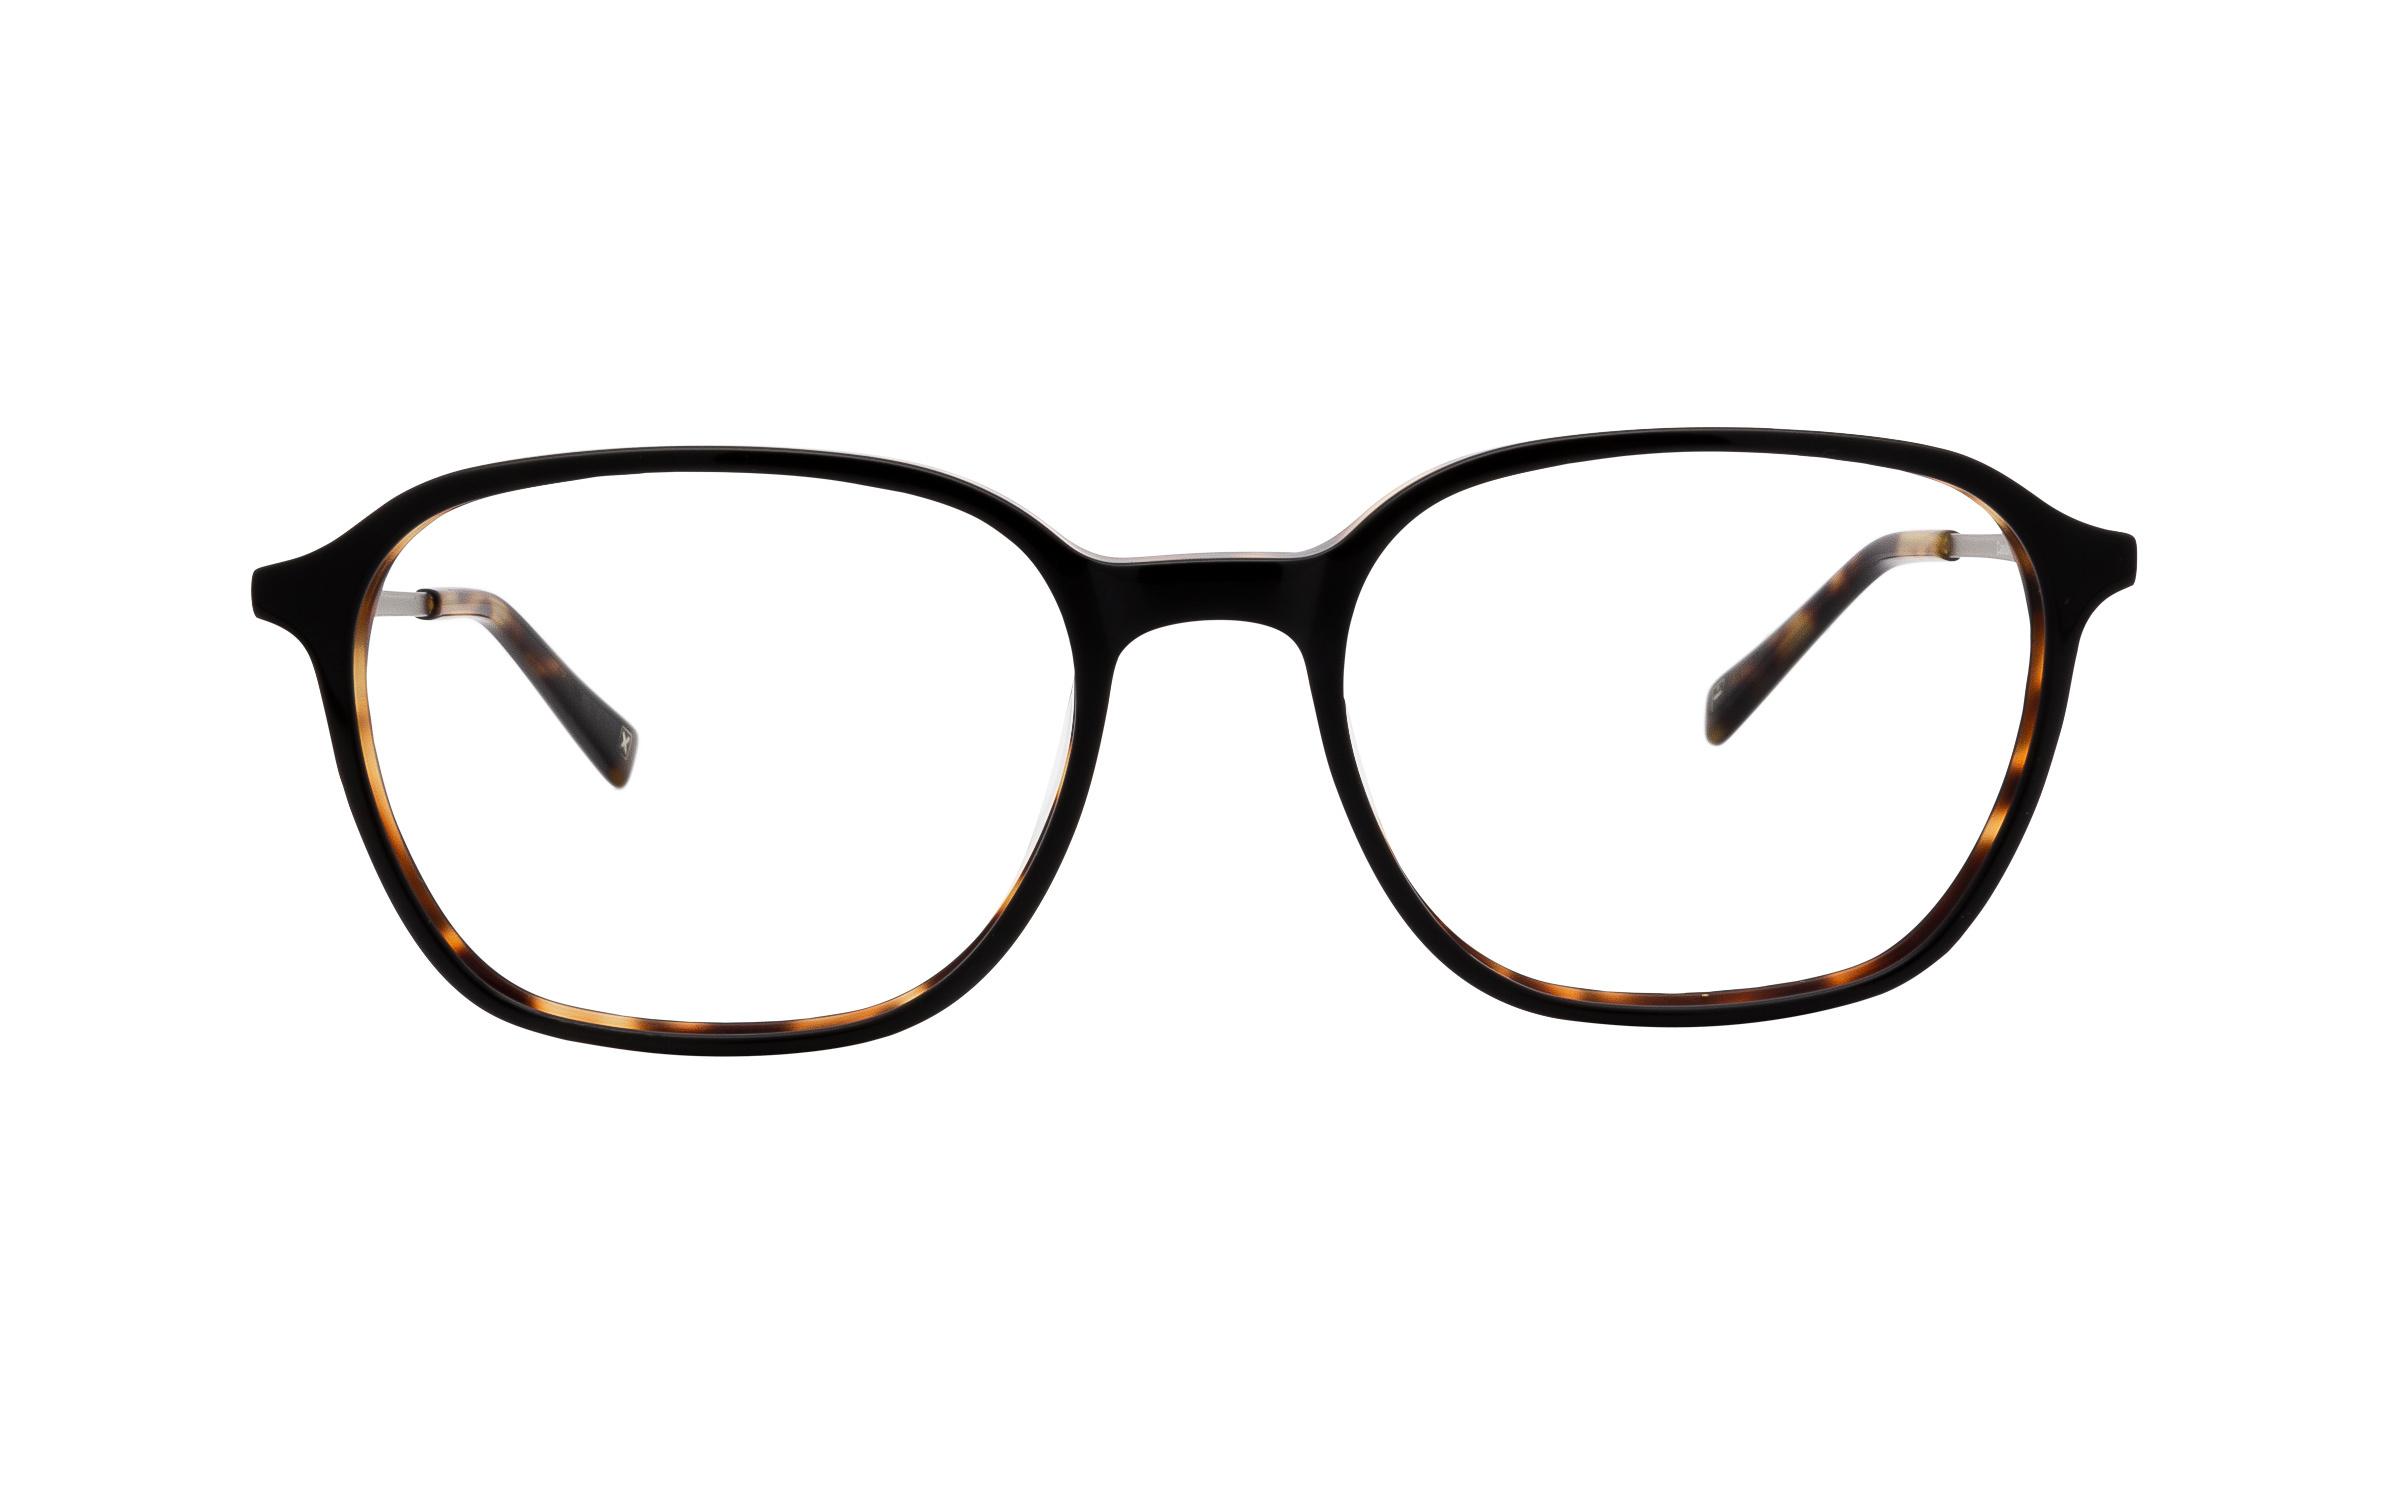 http://www.coastal.com/ - Derek Cardigan Caelum DC236 C01 (53) Eyeglasses and Frame in Shiny Havana Black | Acetate – Online Coastal